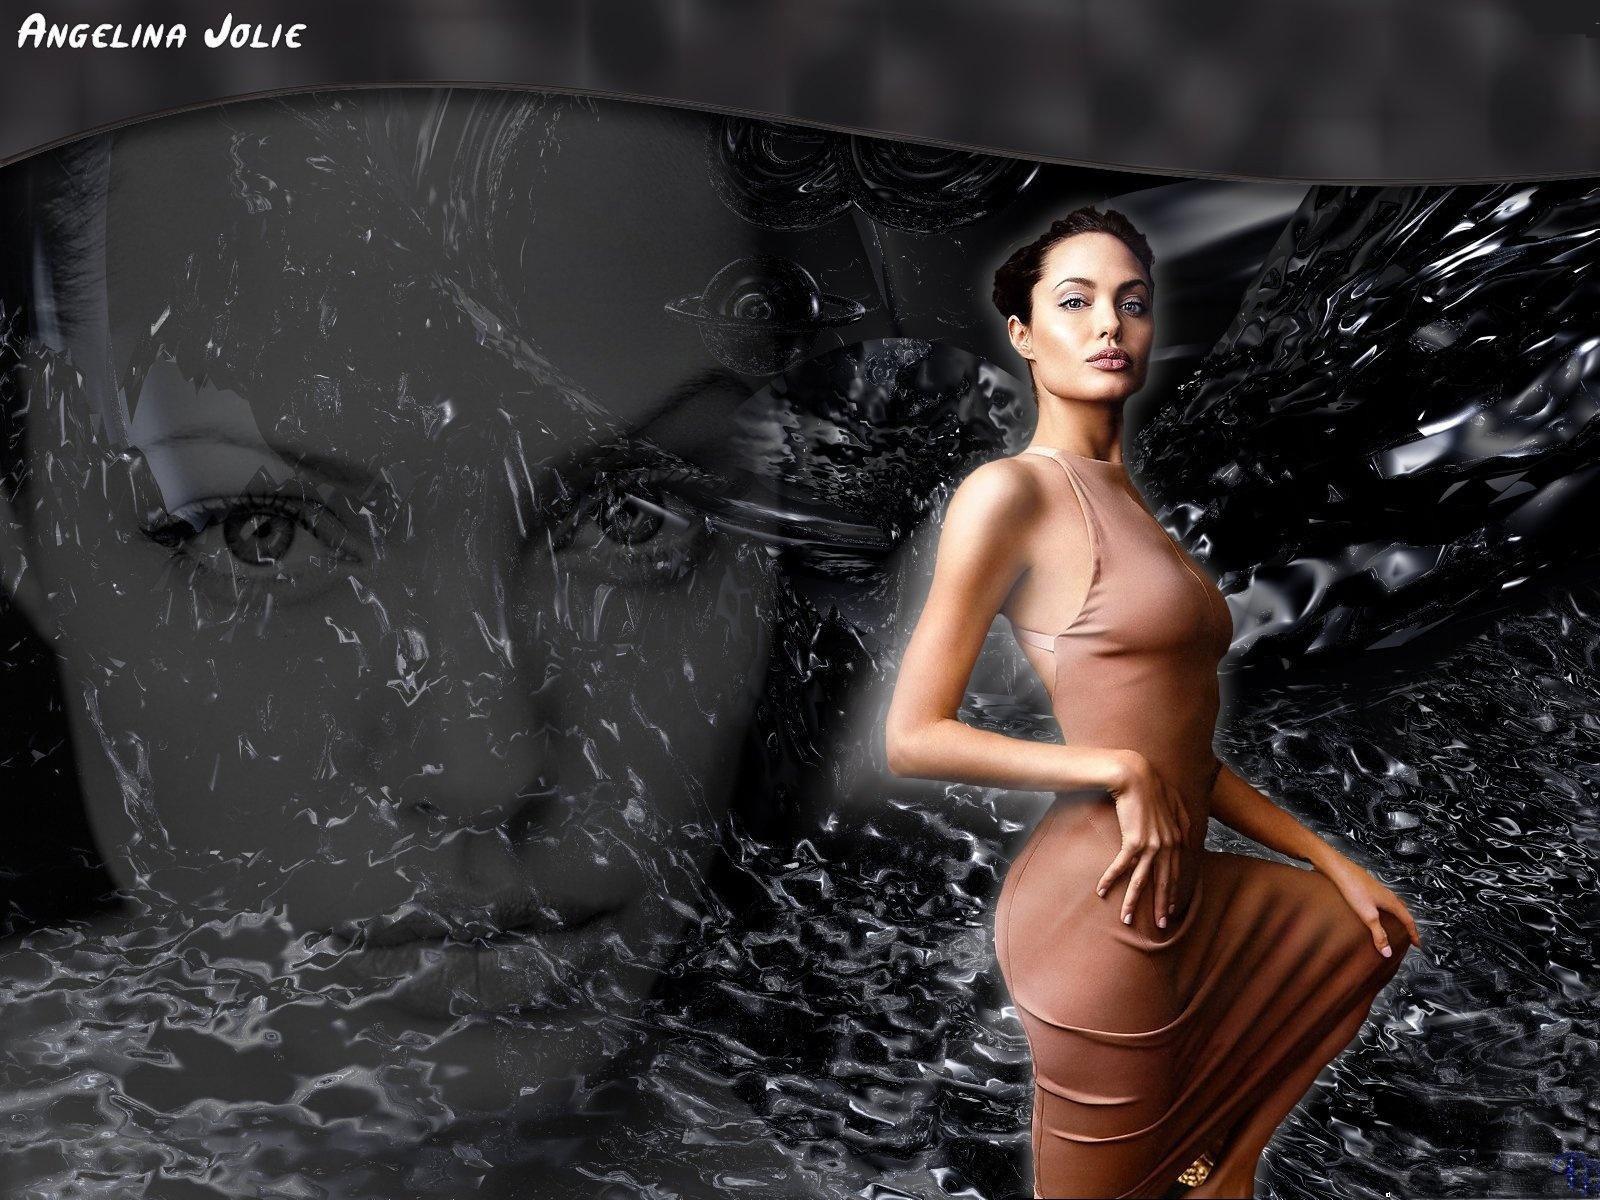 Angelina Jolie Naked Wallpaper